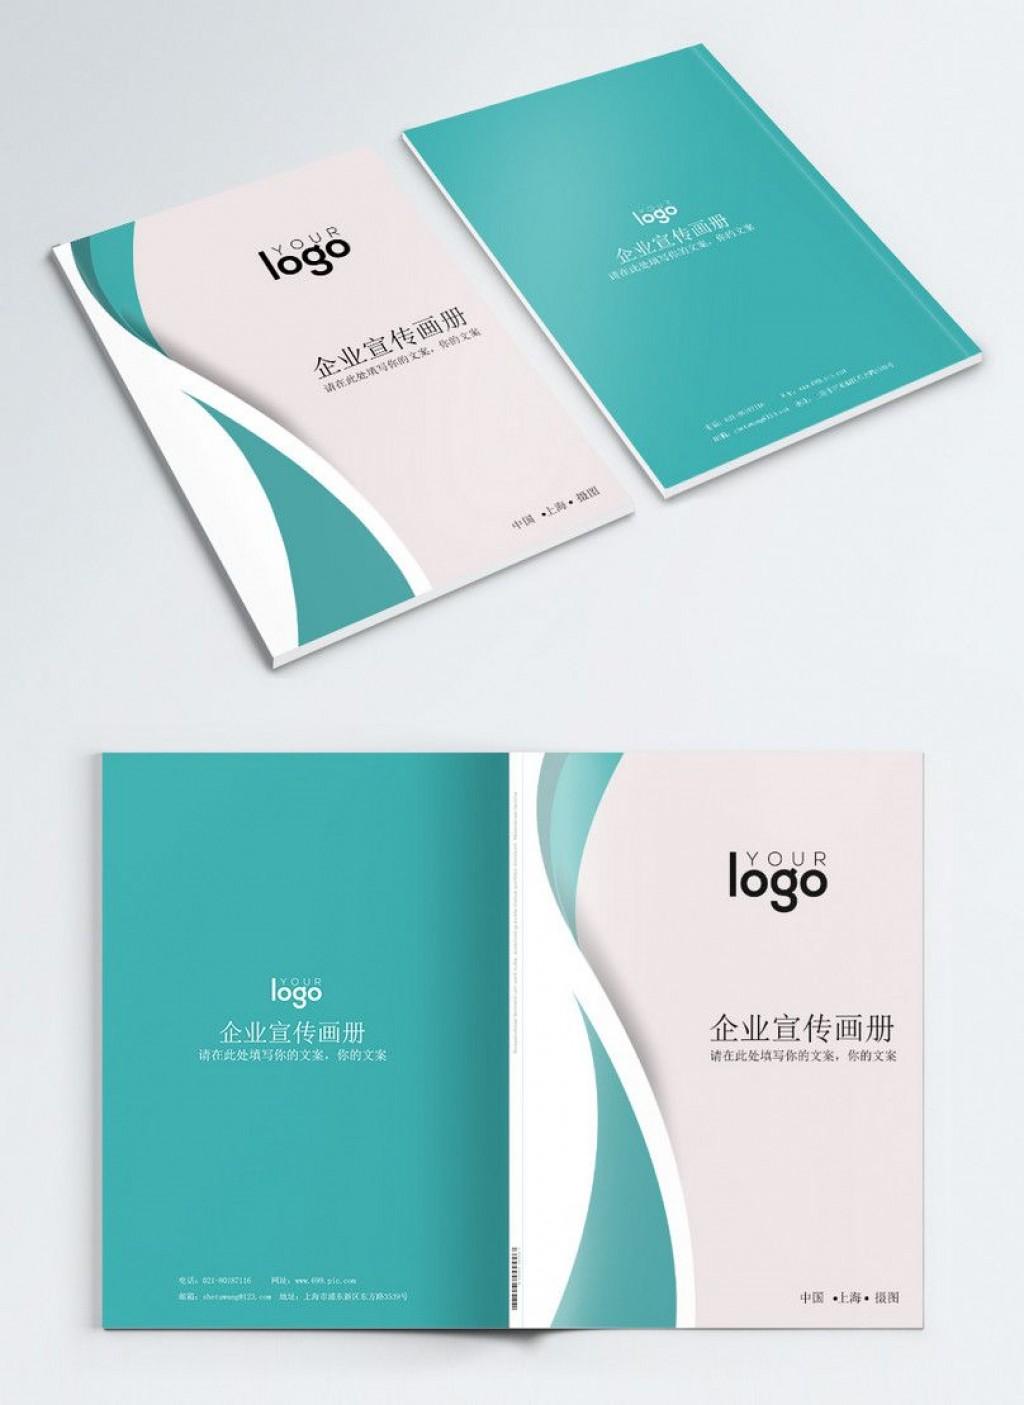 003 Top Book Cover Template Free Download Sample  Illustrator Design Vector IllustrationLarge